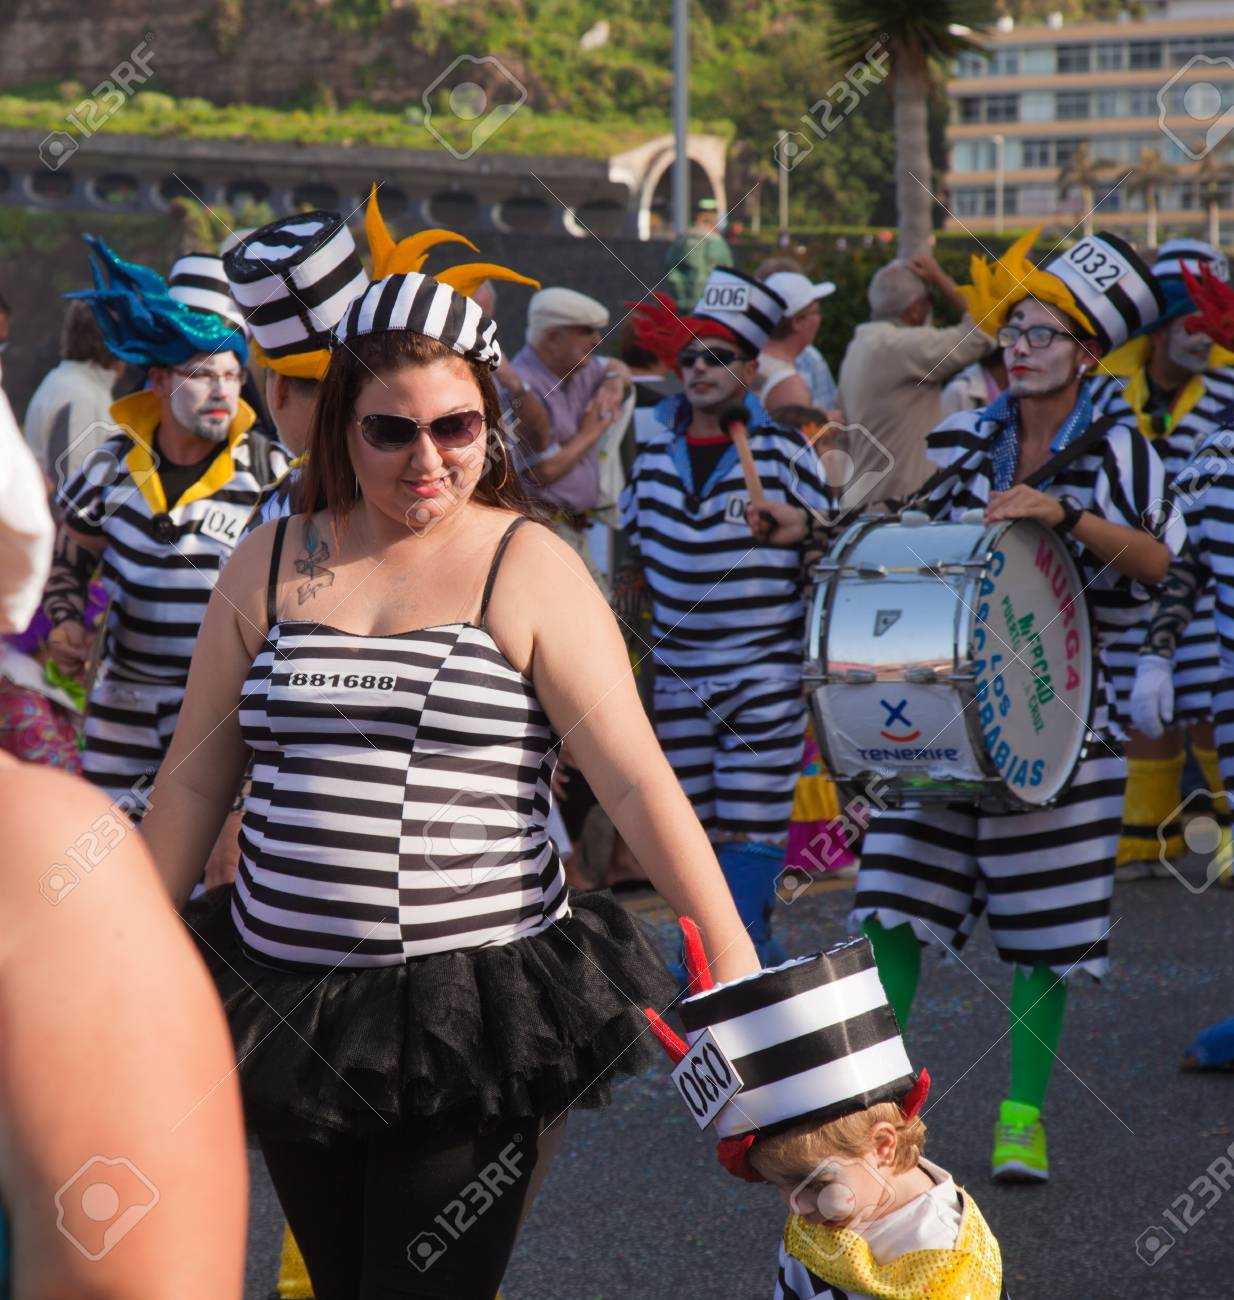 PUERTO DE LA CRUZ, SPAIN - February 16: Colorfully dressed participants take part in main carnival parade on February 16, 2013 in Puerto de la Cruz, Tenerife, Spain Stock Photo - 18535847